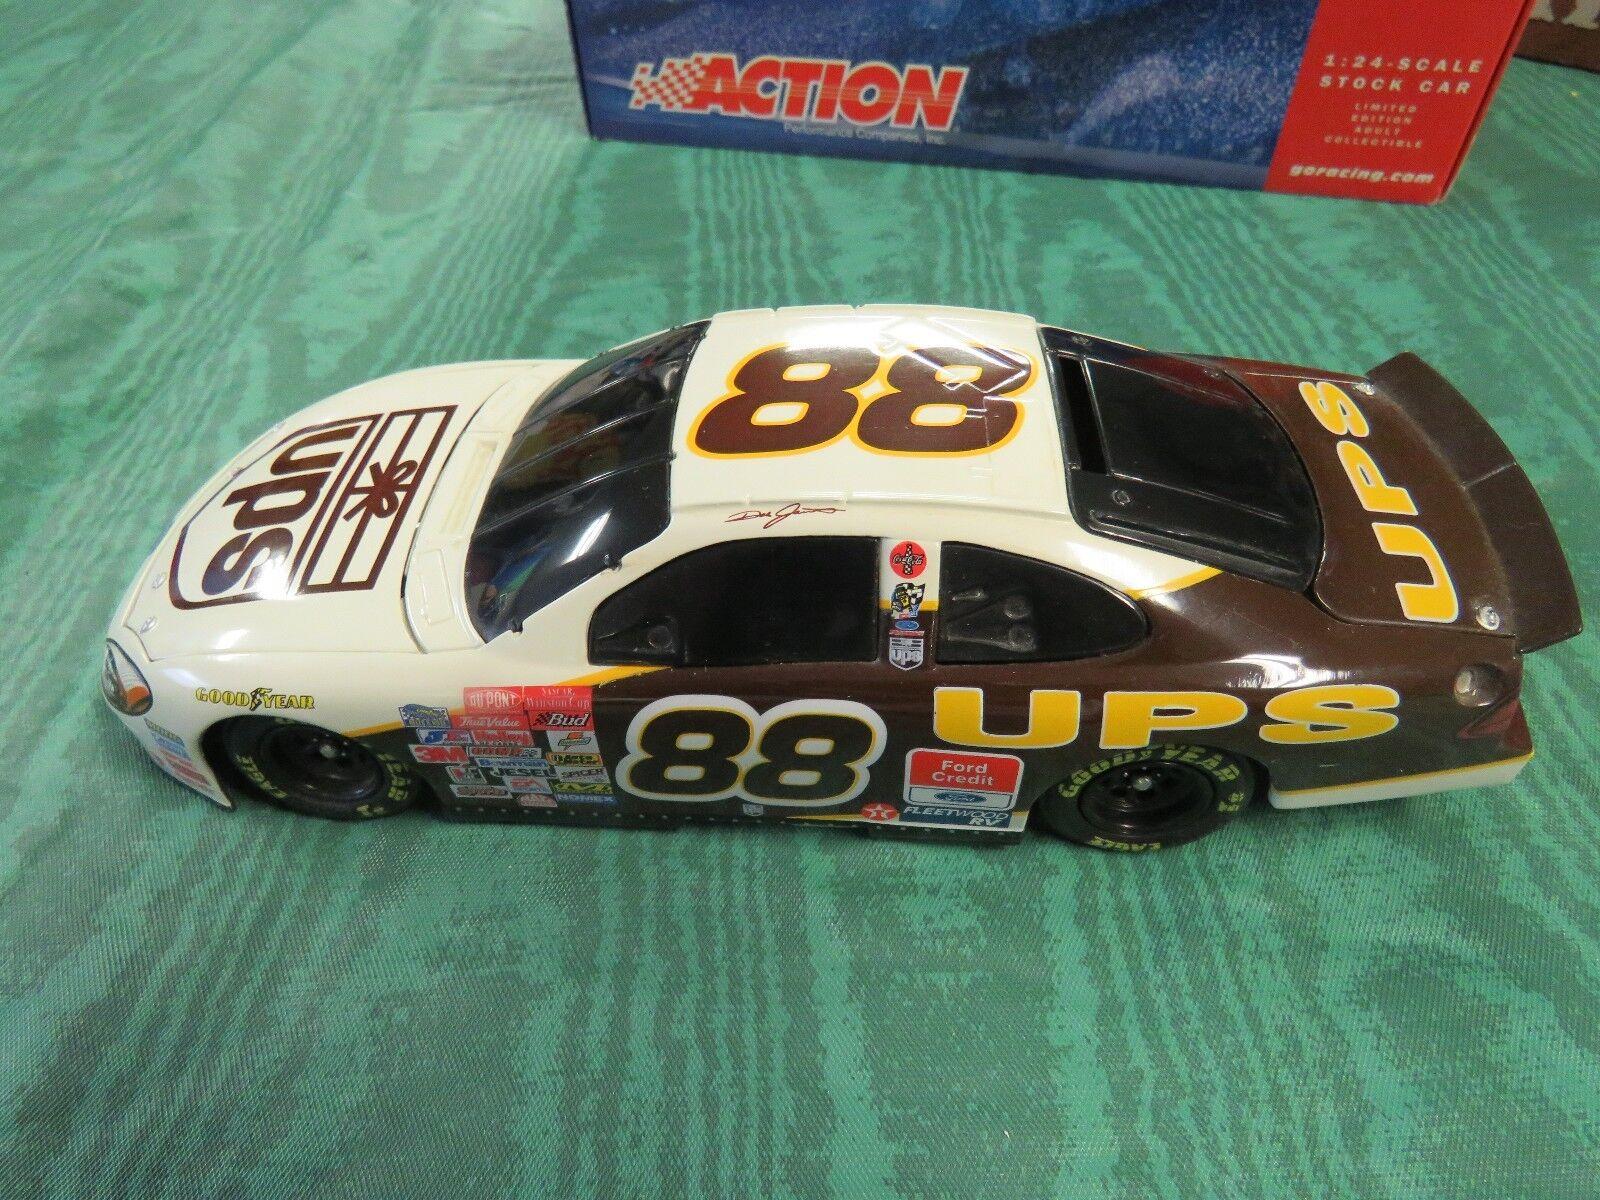 NASCAR 1 24 DIECAST DALE JARRETT,UPS,ACTION,2001 FORD TAURUS LIMITED EDITION